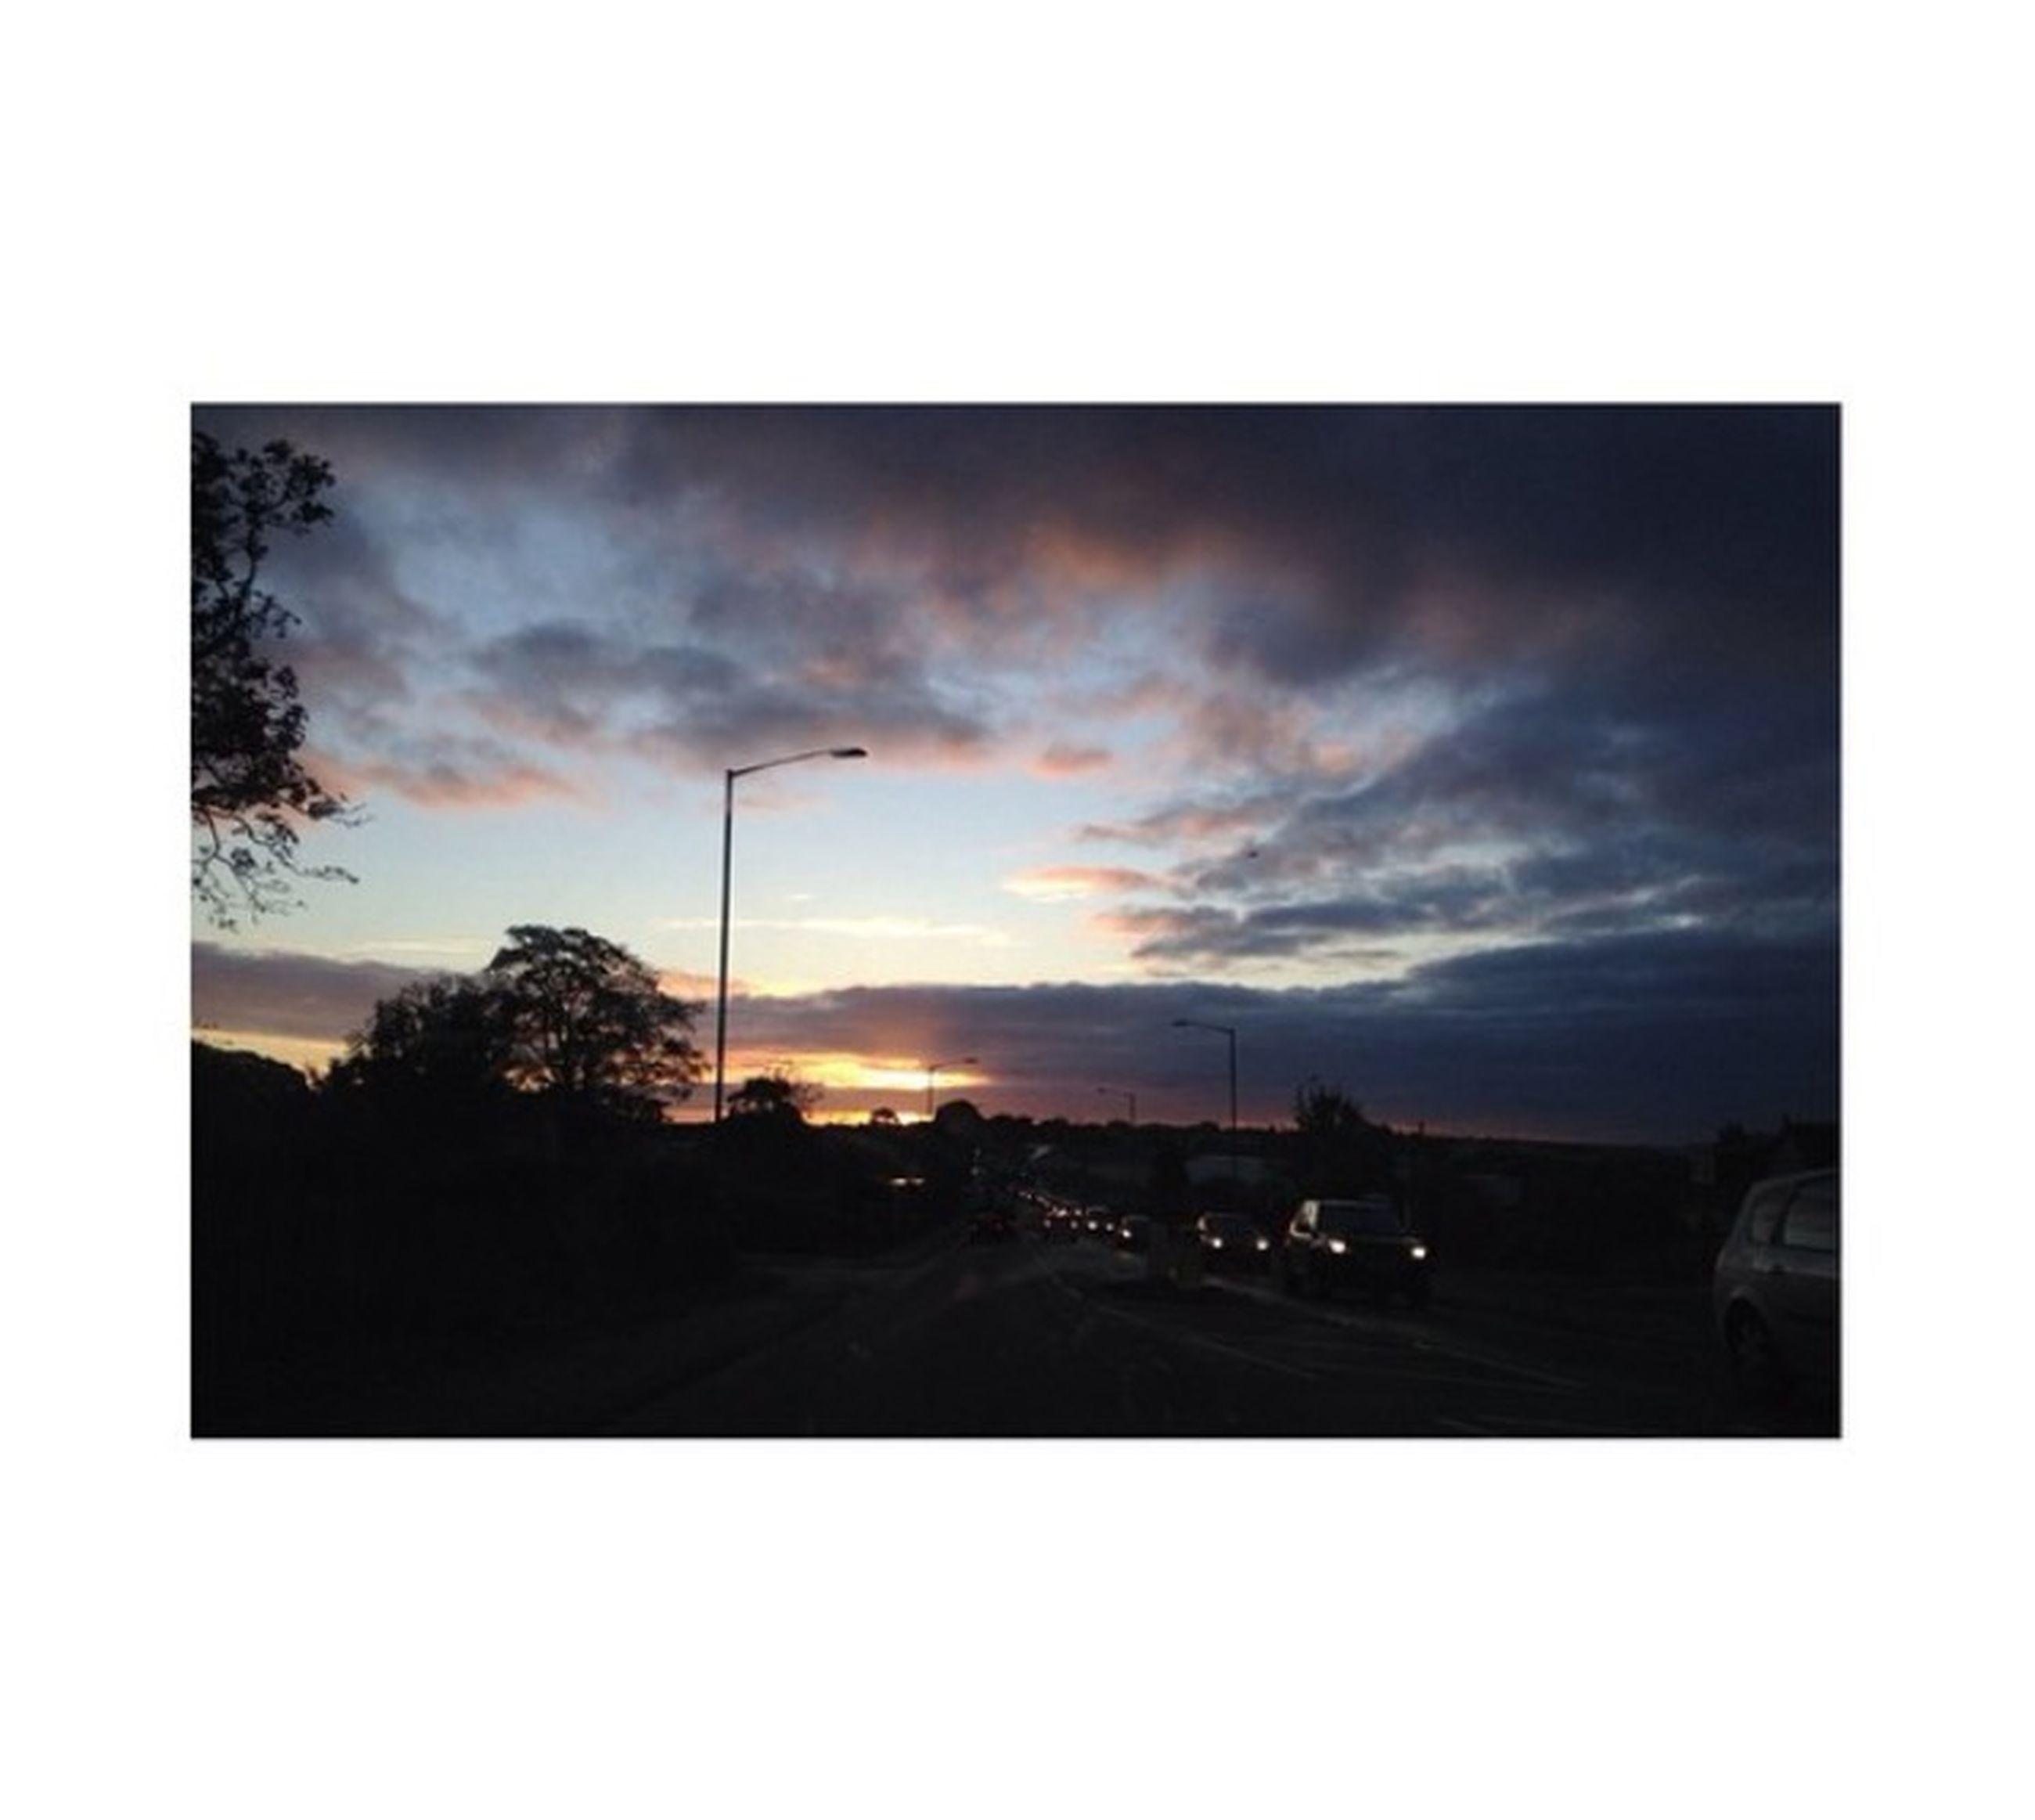 sunset, sky, silhouette, transportation, car, transfer print, cloud - sky, road, land vehicle, auto post production filter, building exterior, street, street light, built structure, mode of transport, cloud, cloudy, tree, nature, dusk